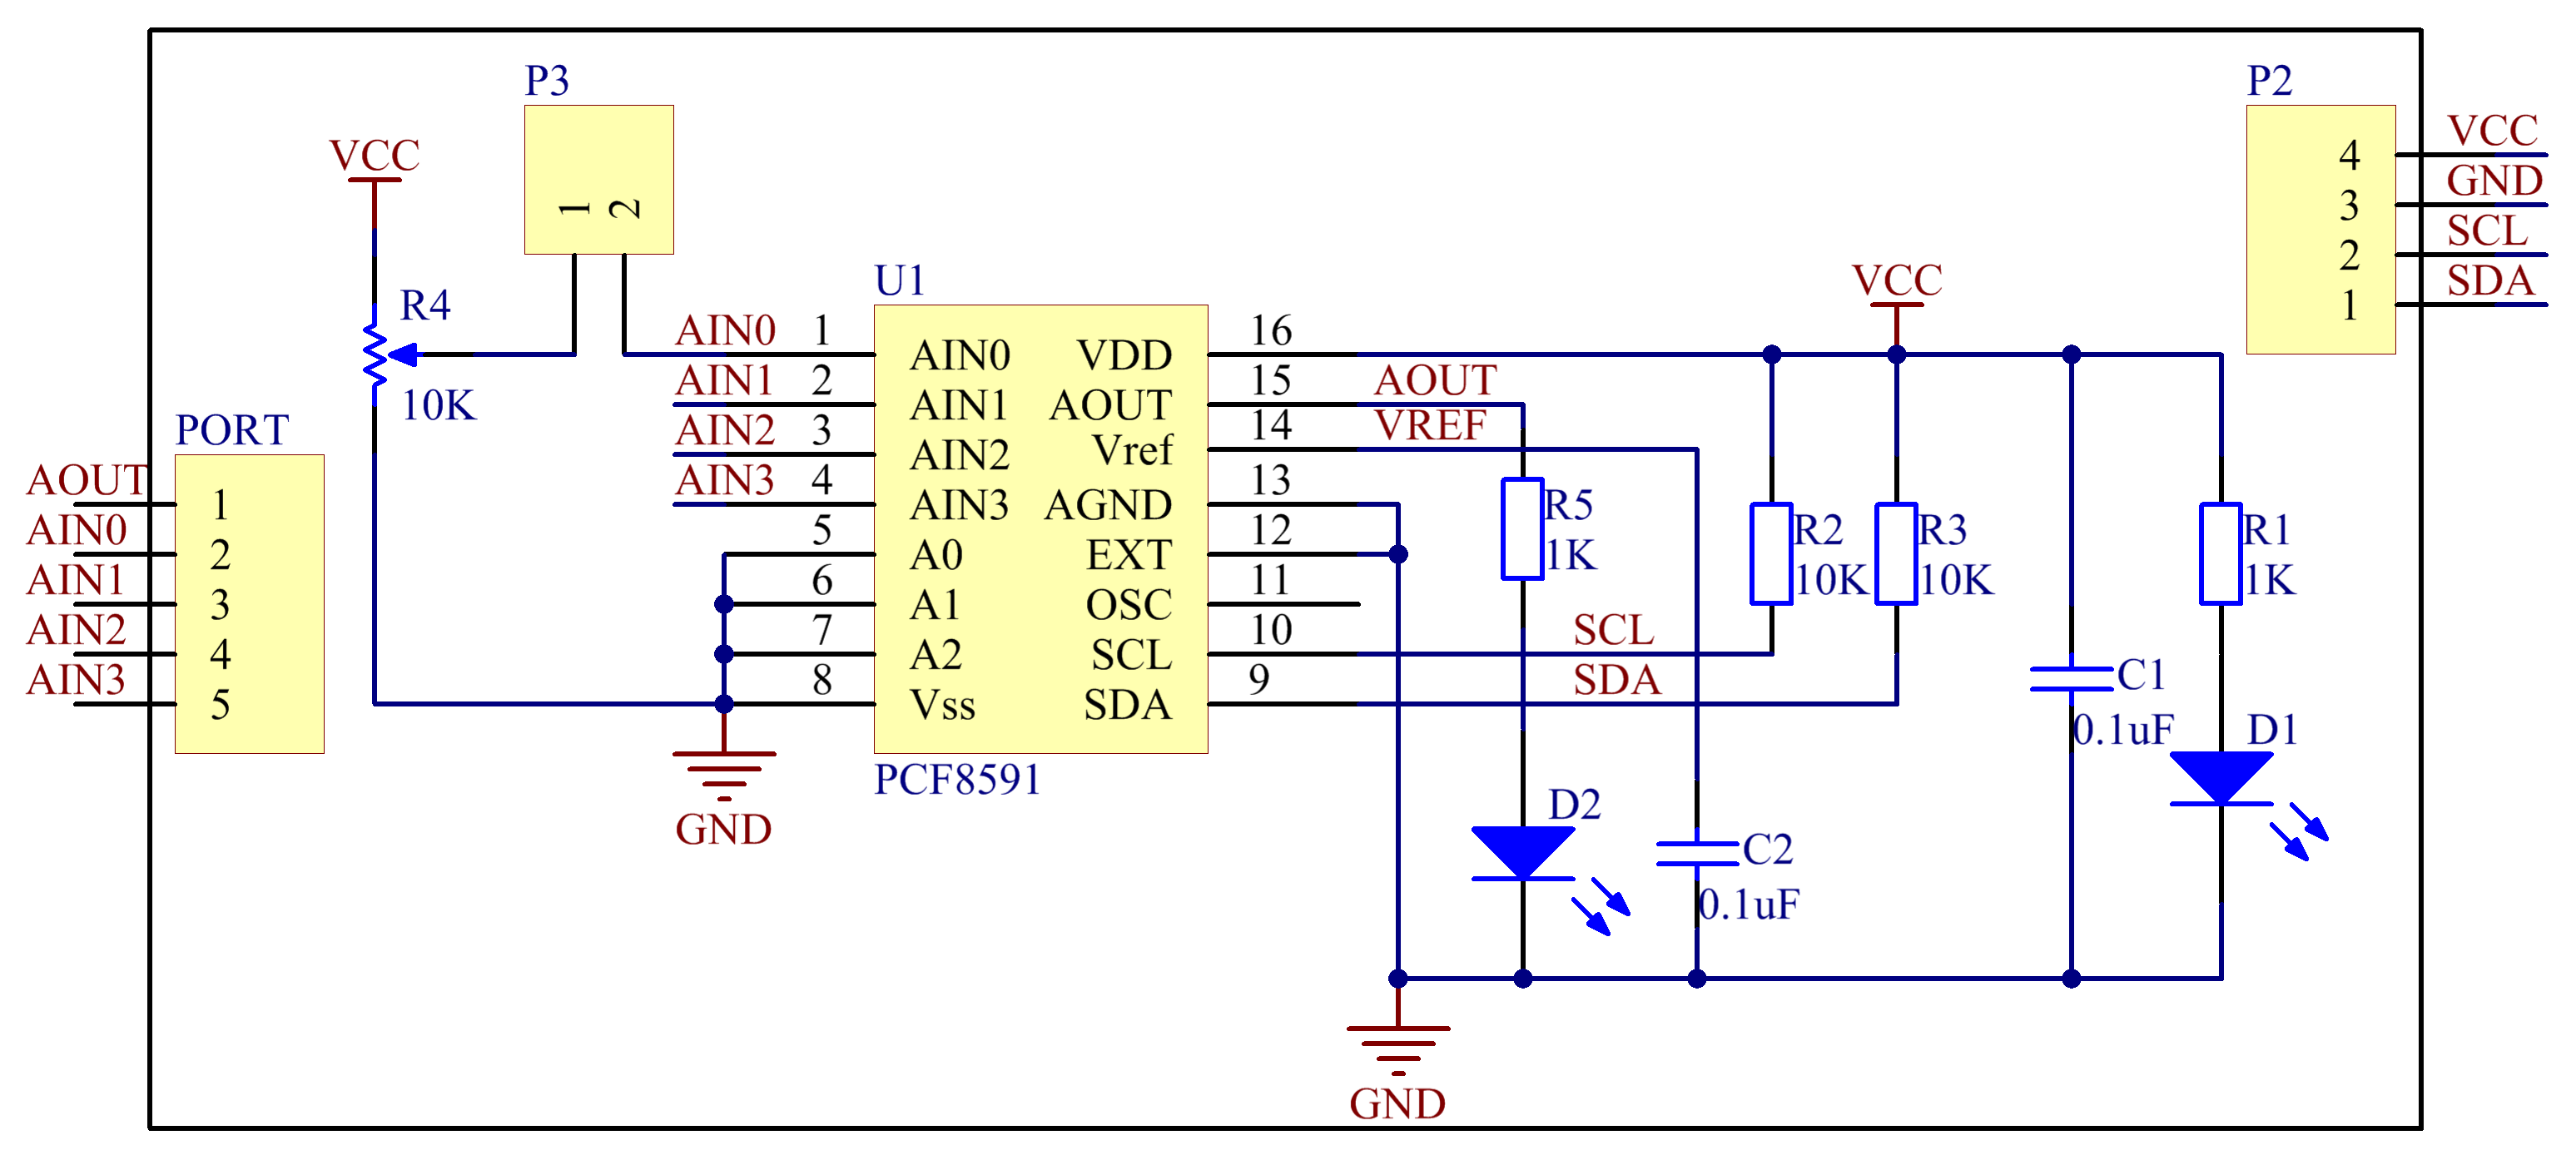 Filecfdf Wiki Raspberry Pi B Circuit Diagram 0635 24 March 2016